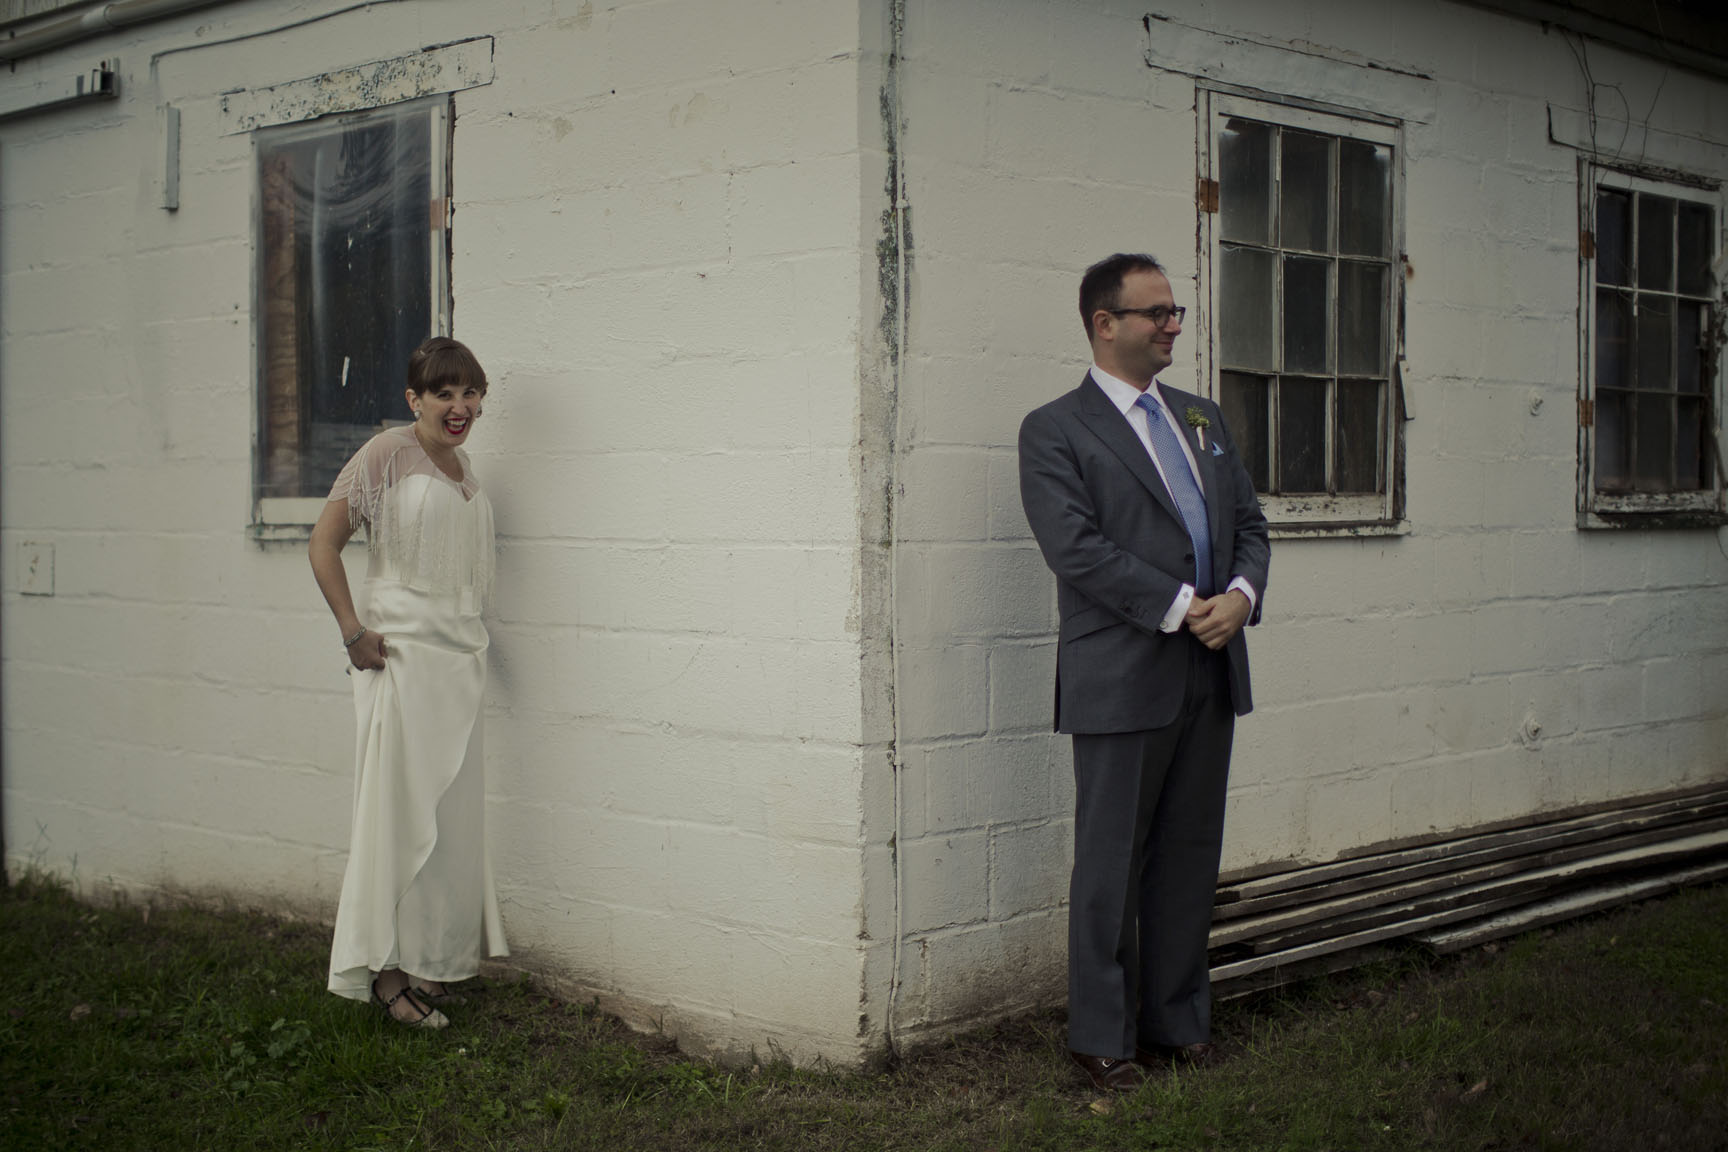 SGP_Alison&Dave_TheStory051